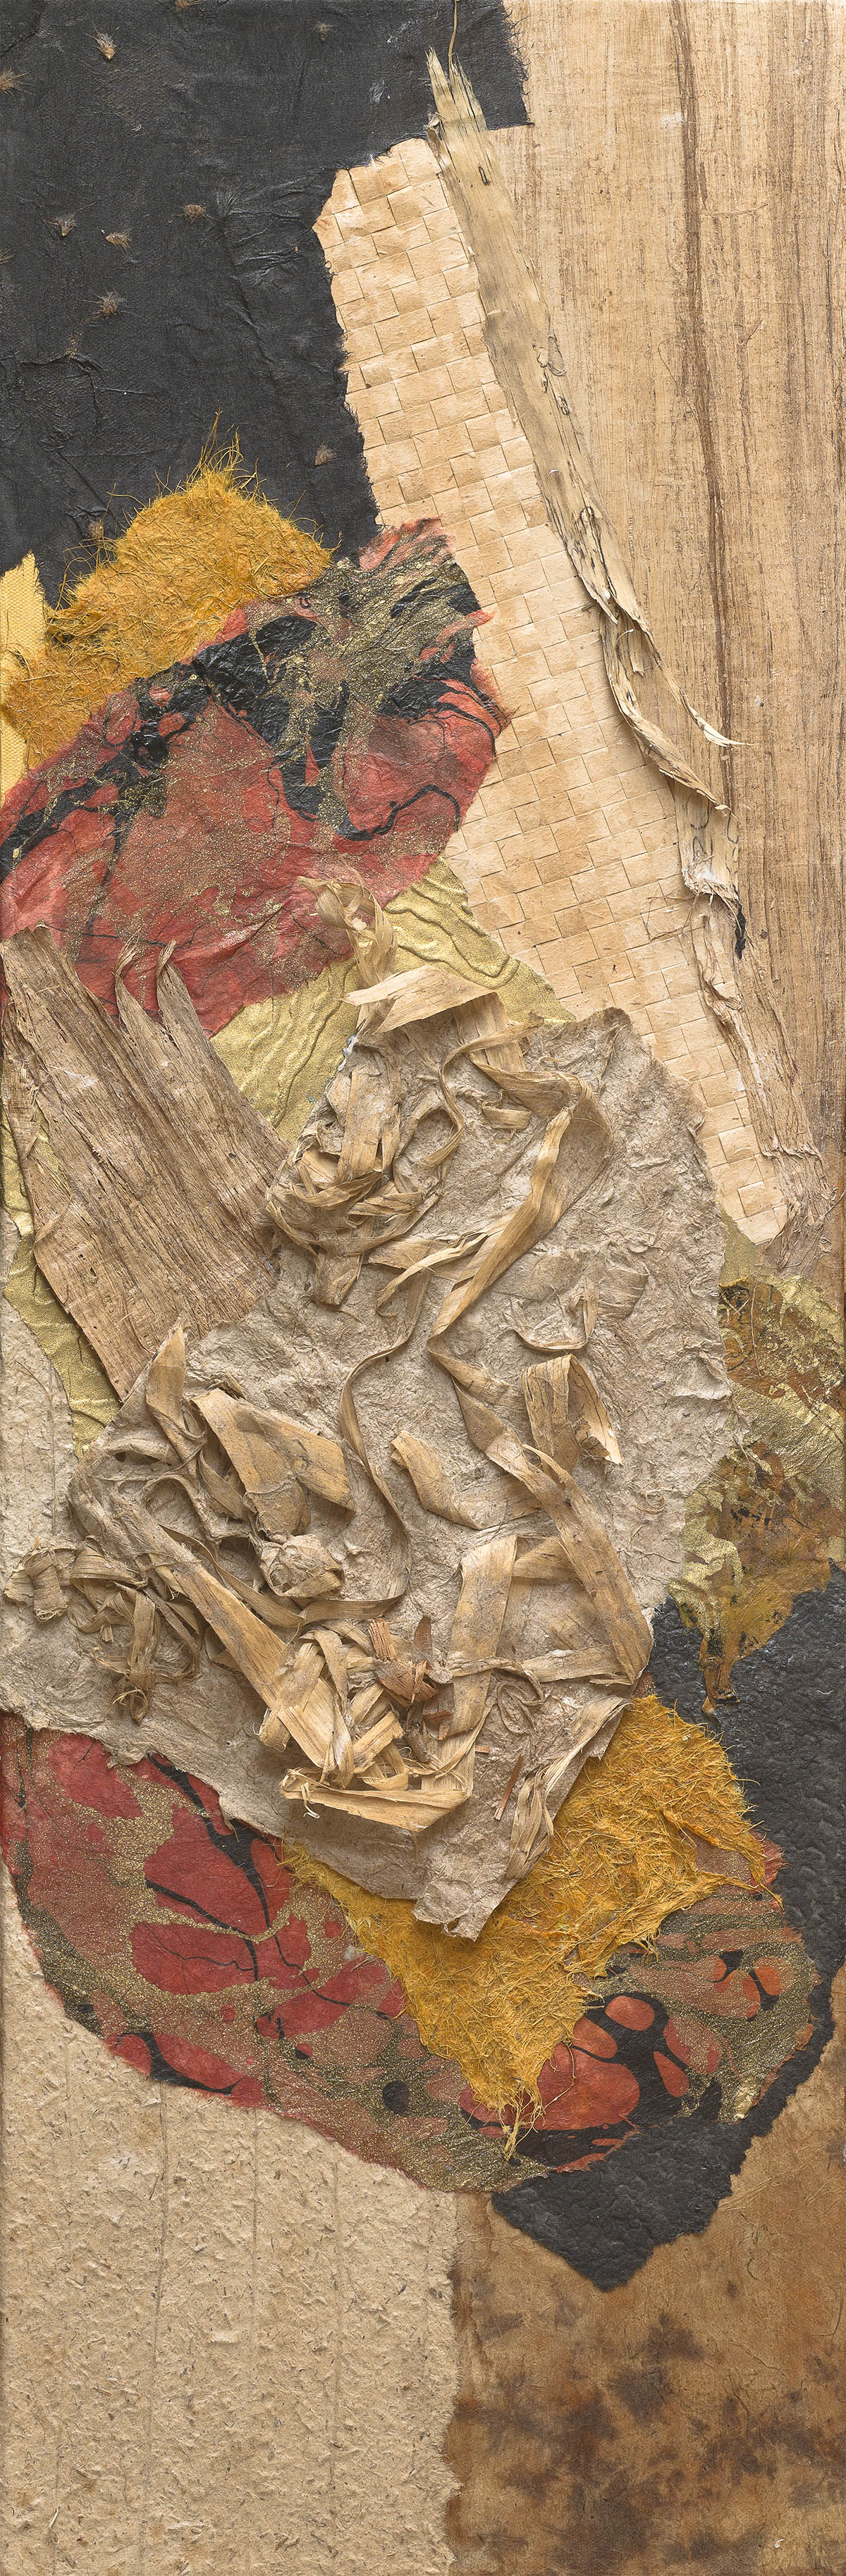 GD wPapyrus & Wood Shavings 2